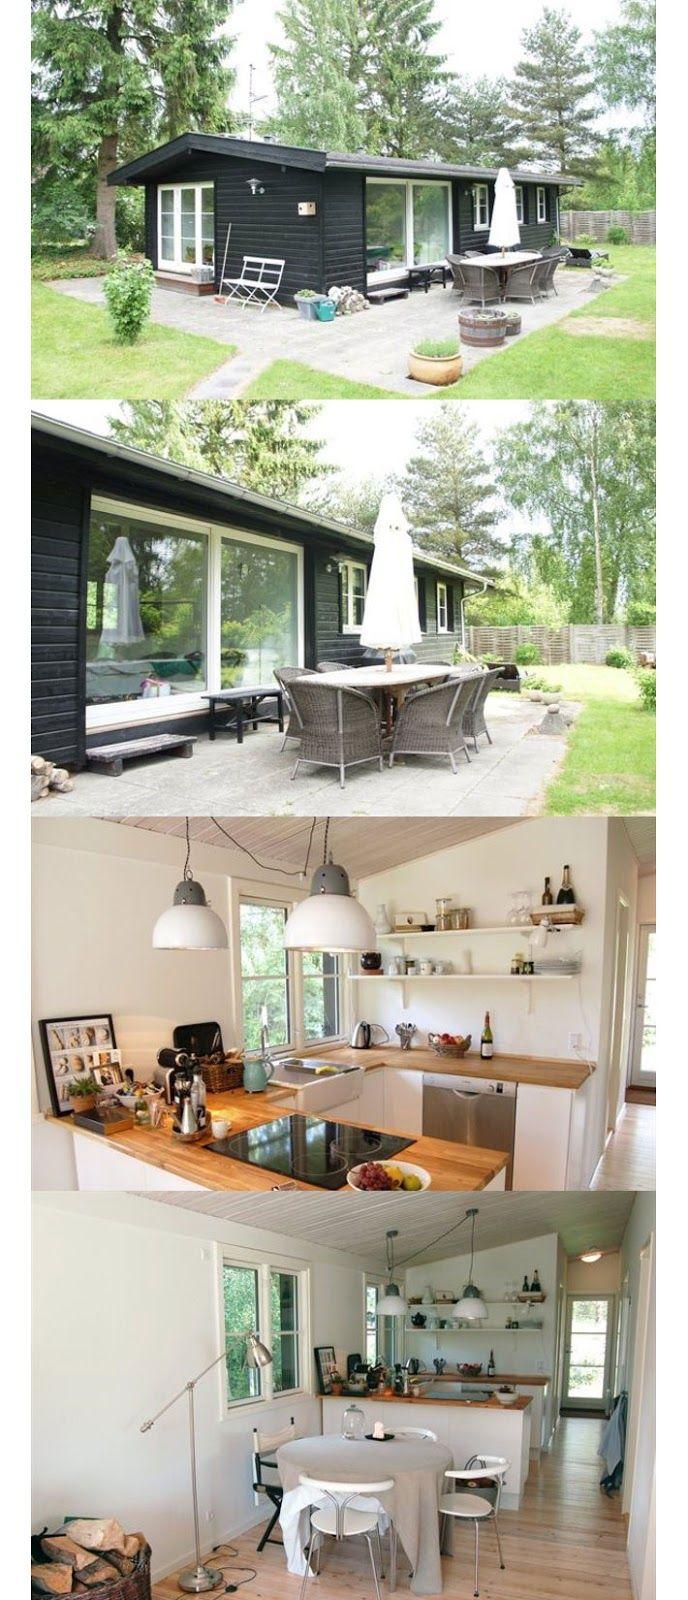 amalie loves denmark urlaub in d nemark cottage in. Black Bedroom Furniture Sets. Home Design Ideas